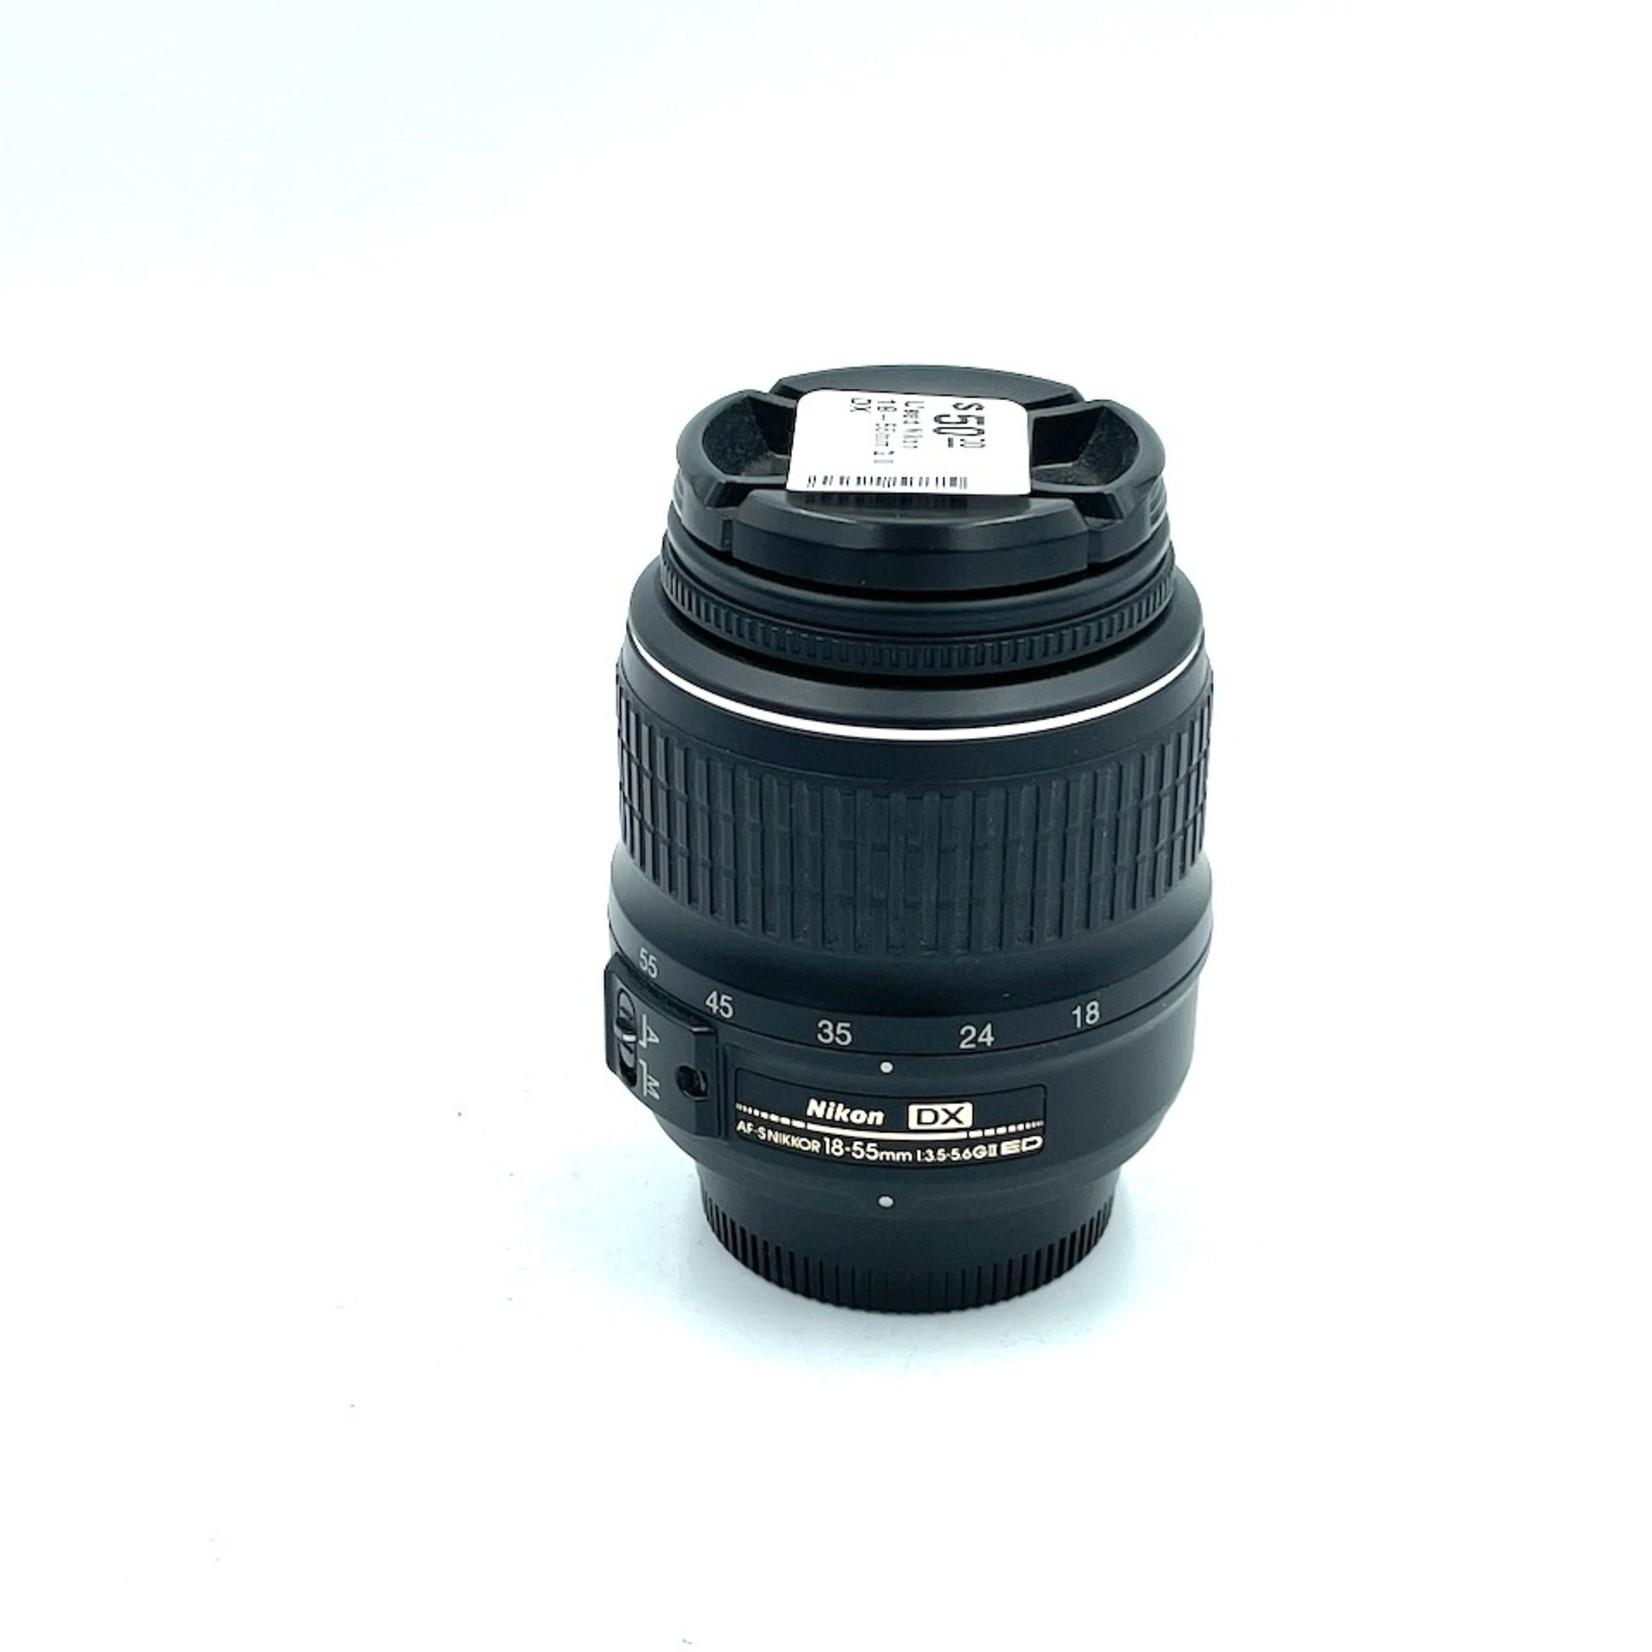 Nikon Used Nikon 18-55mm G ll DX